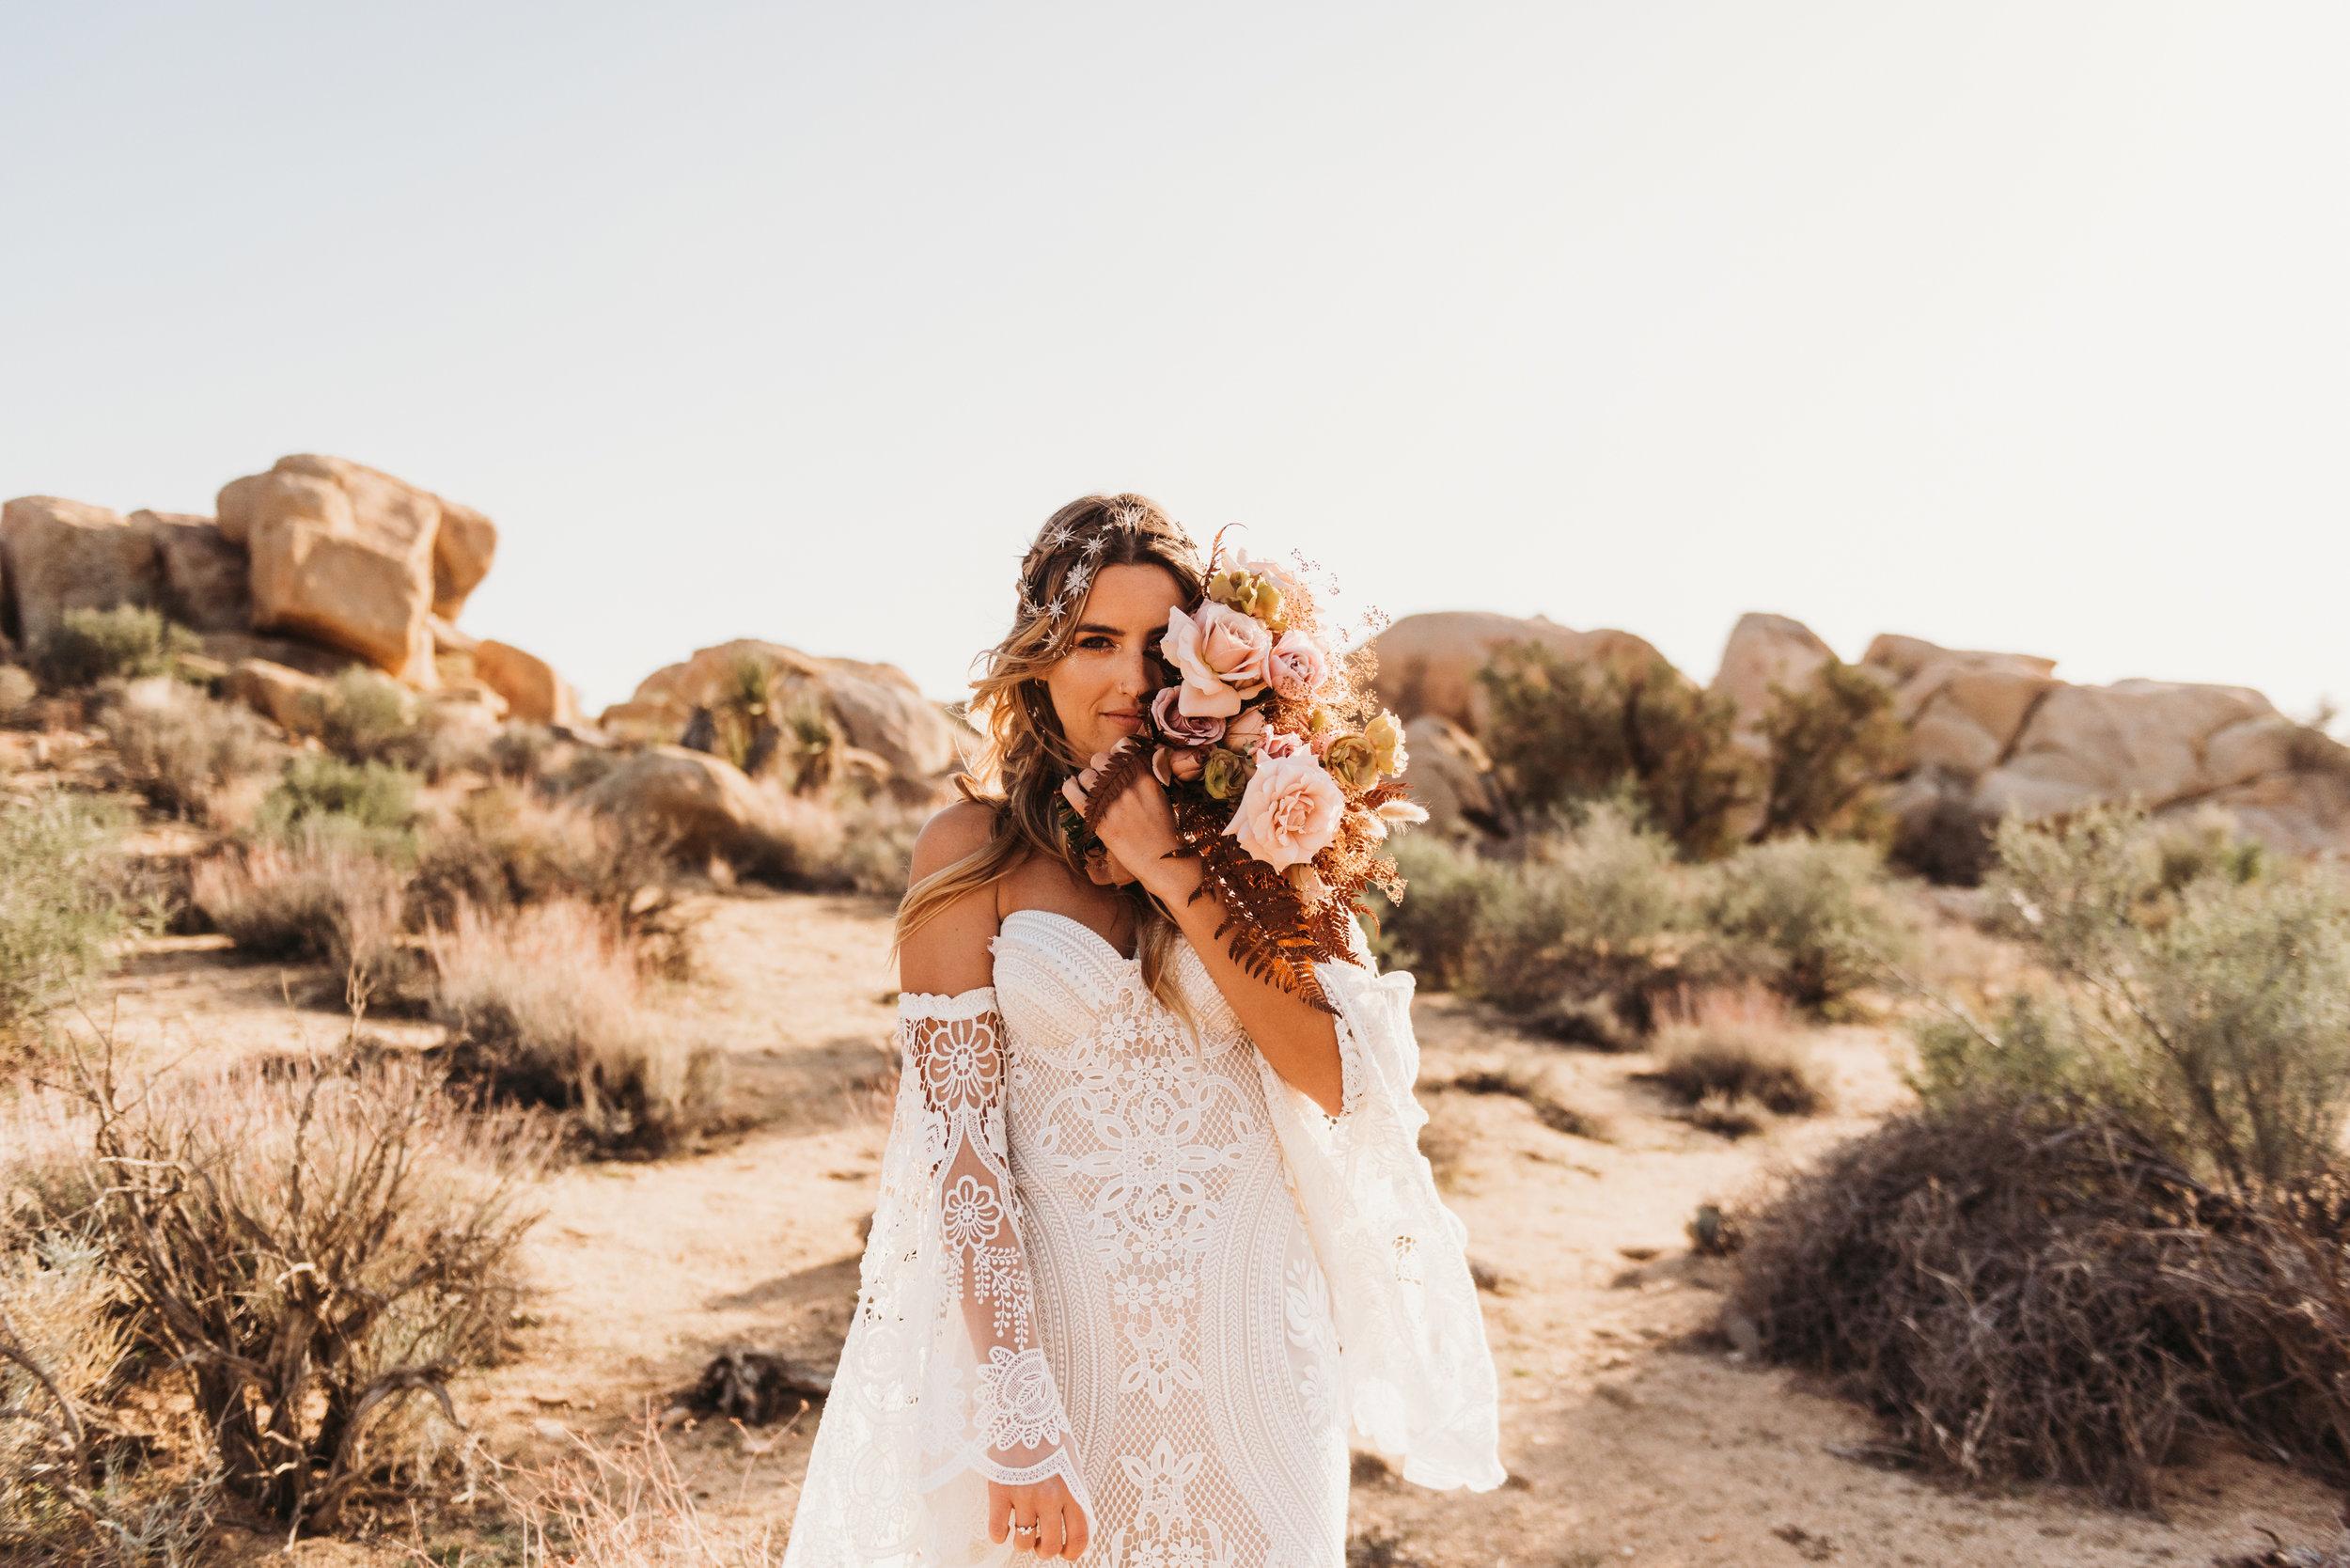 FortSt.John_photographer_TyraEPhotography_Wedding_Couple_Family_Photograhy_DawsonCreek_Elopement_Bride_Boduoir_Portraits-4908.jpg